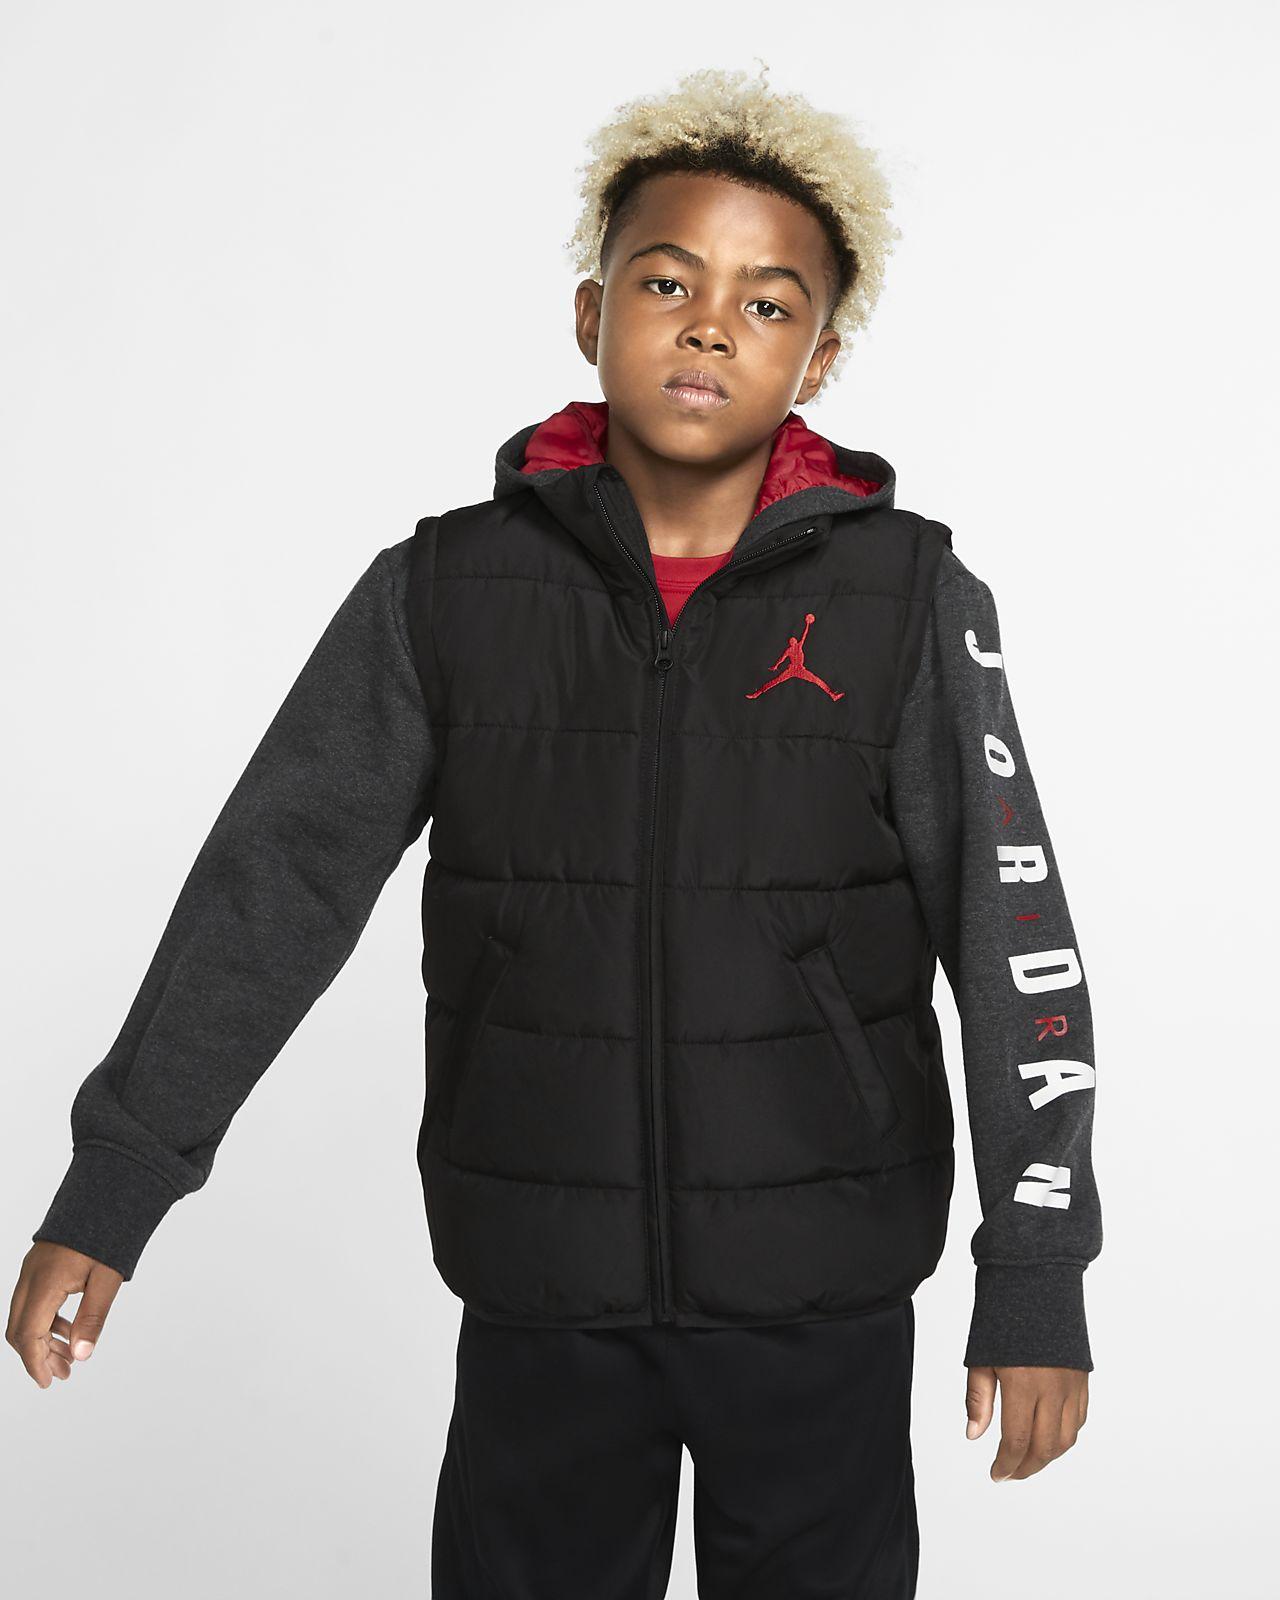 Jordan Jumpman Older Kids' (Boys') Full-Zip Puffer Jacket